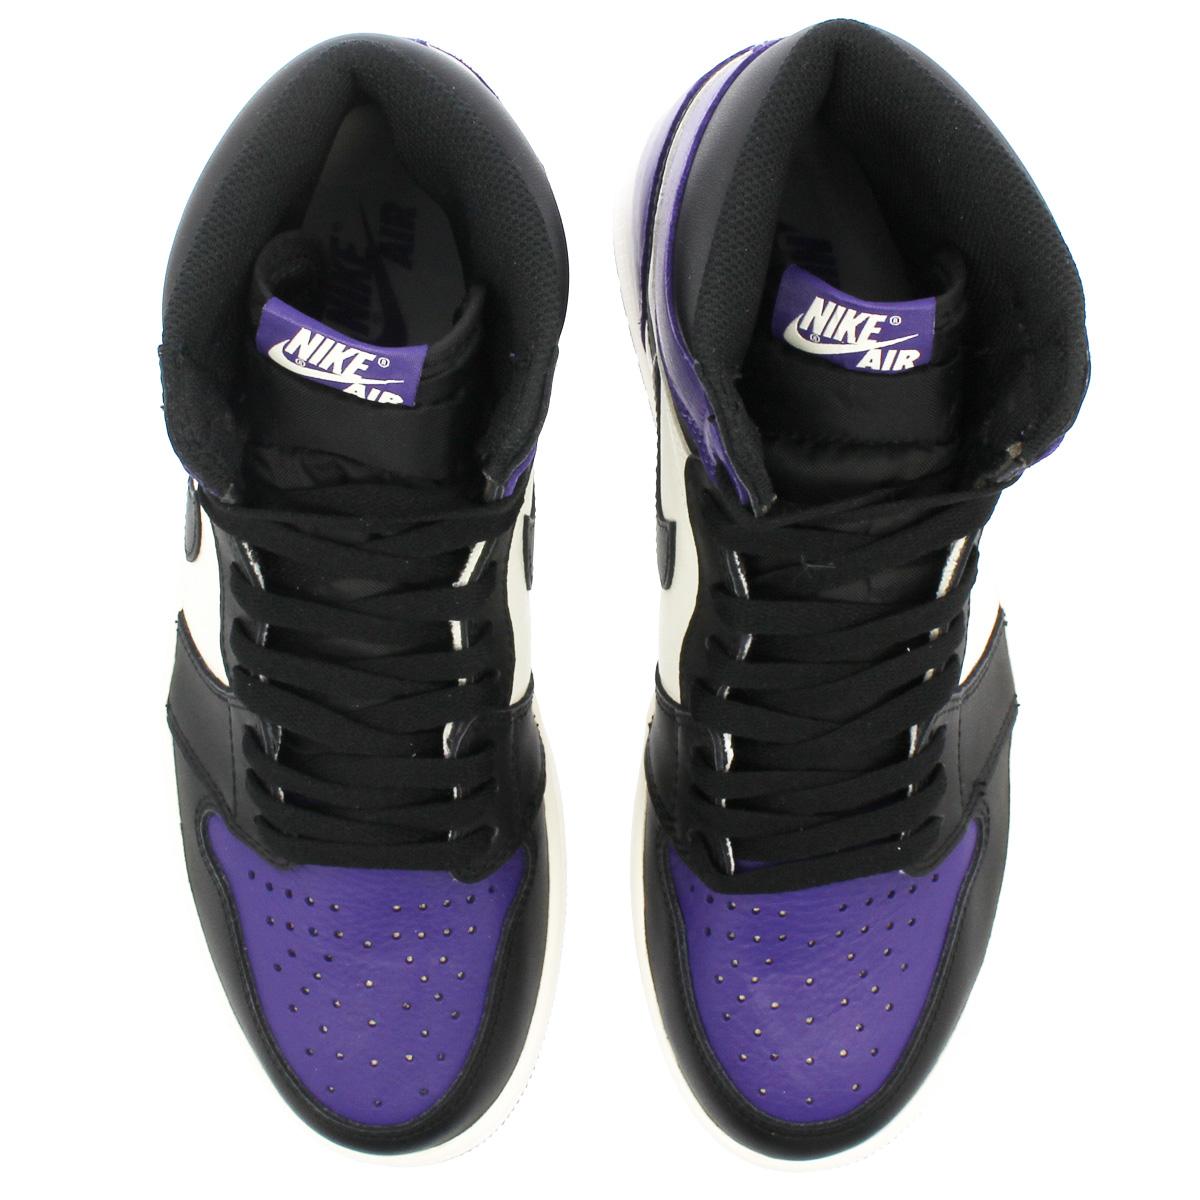 new product d3da4 8c977 NIKE AIR JORDAN 1 RETRO HIGH OG Nike Air Jordan 1 nostalgic high OG COURT  PURPLE BLACK SAIL 555,088-501